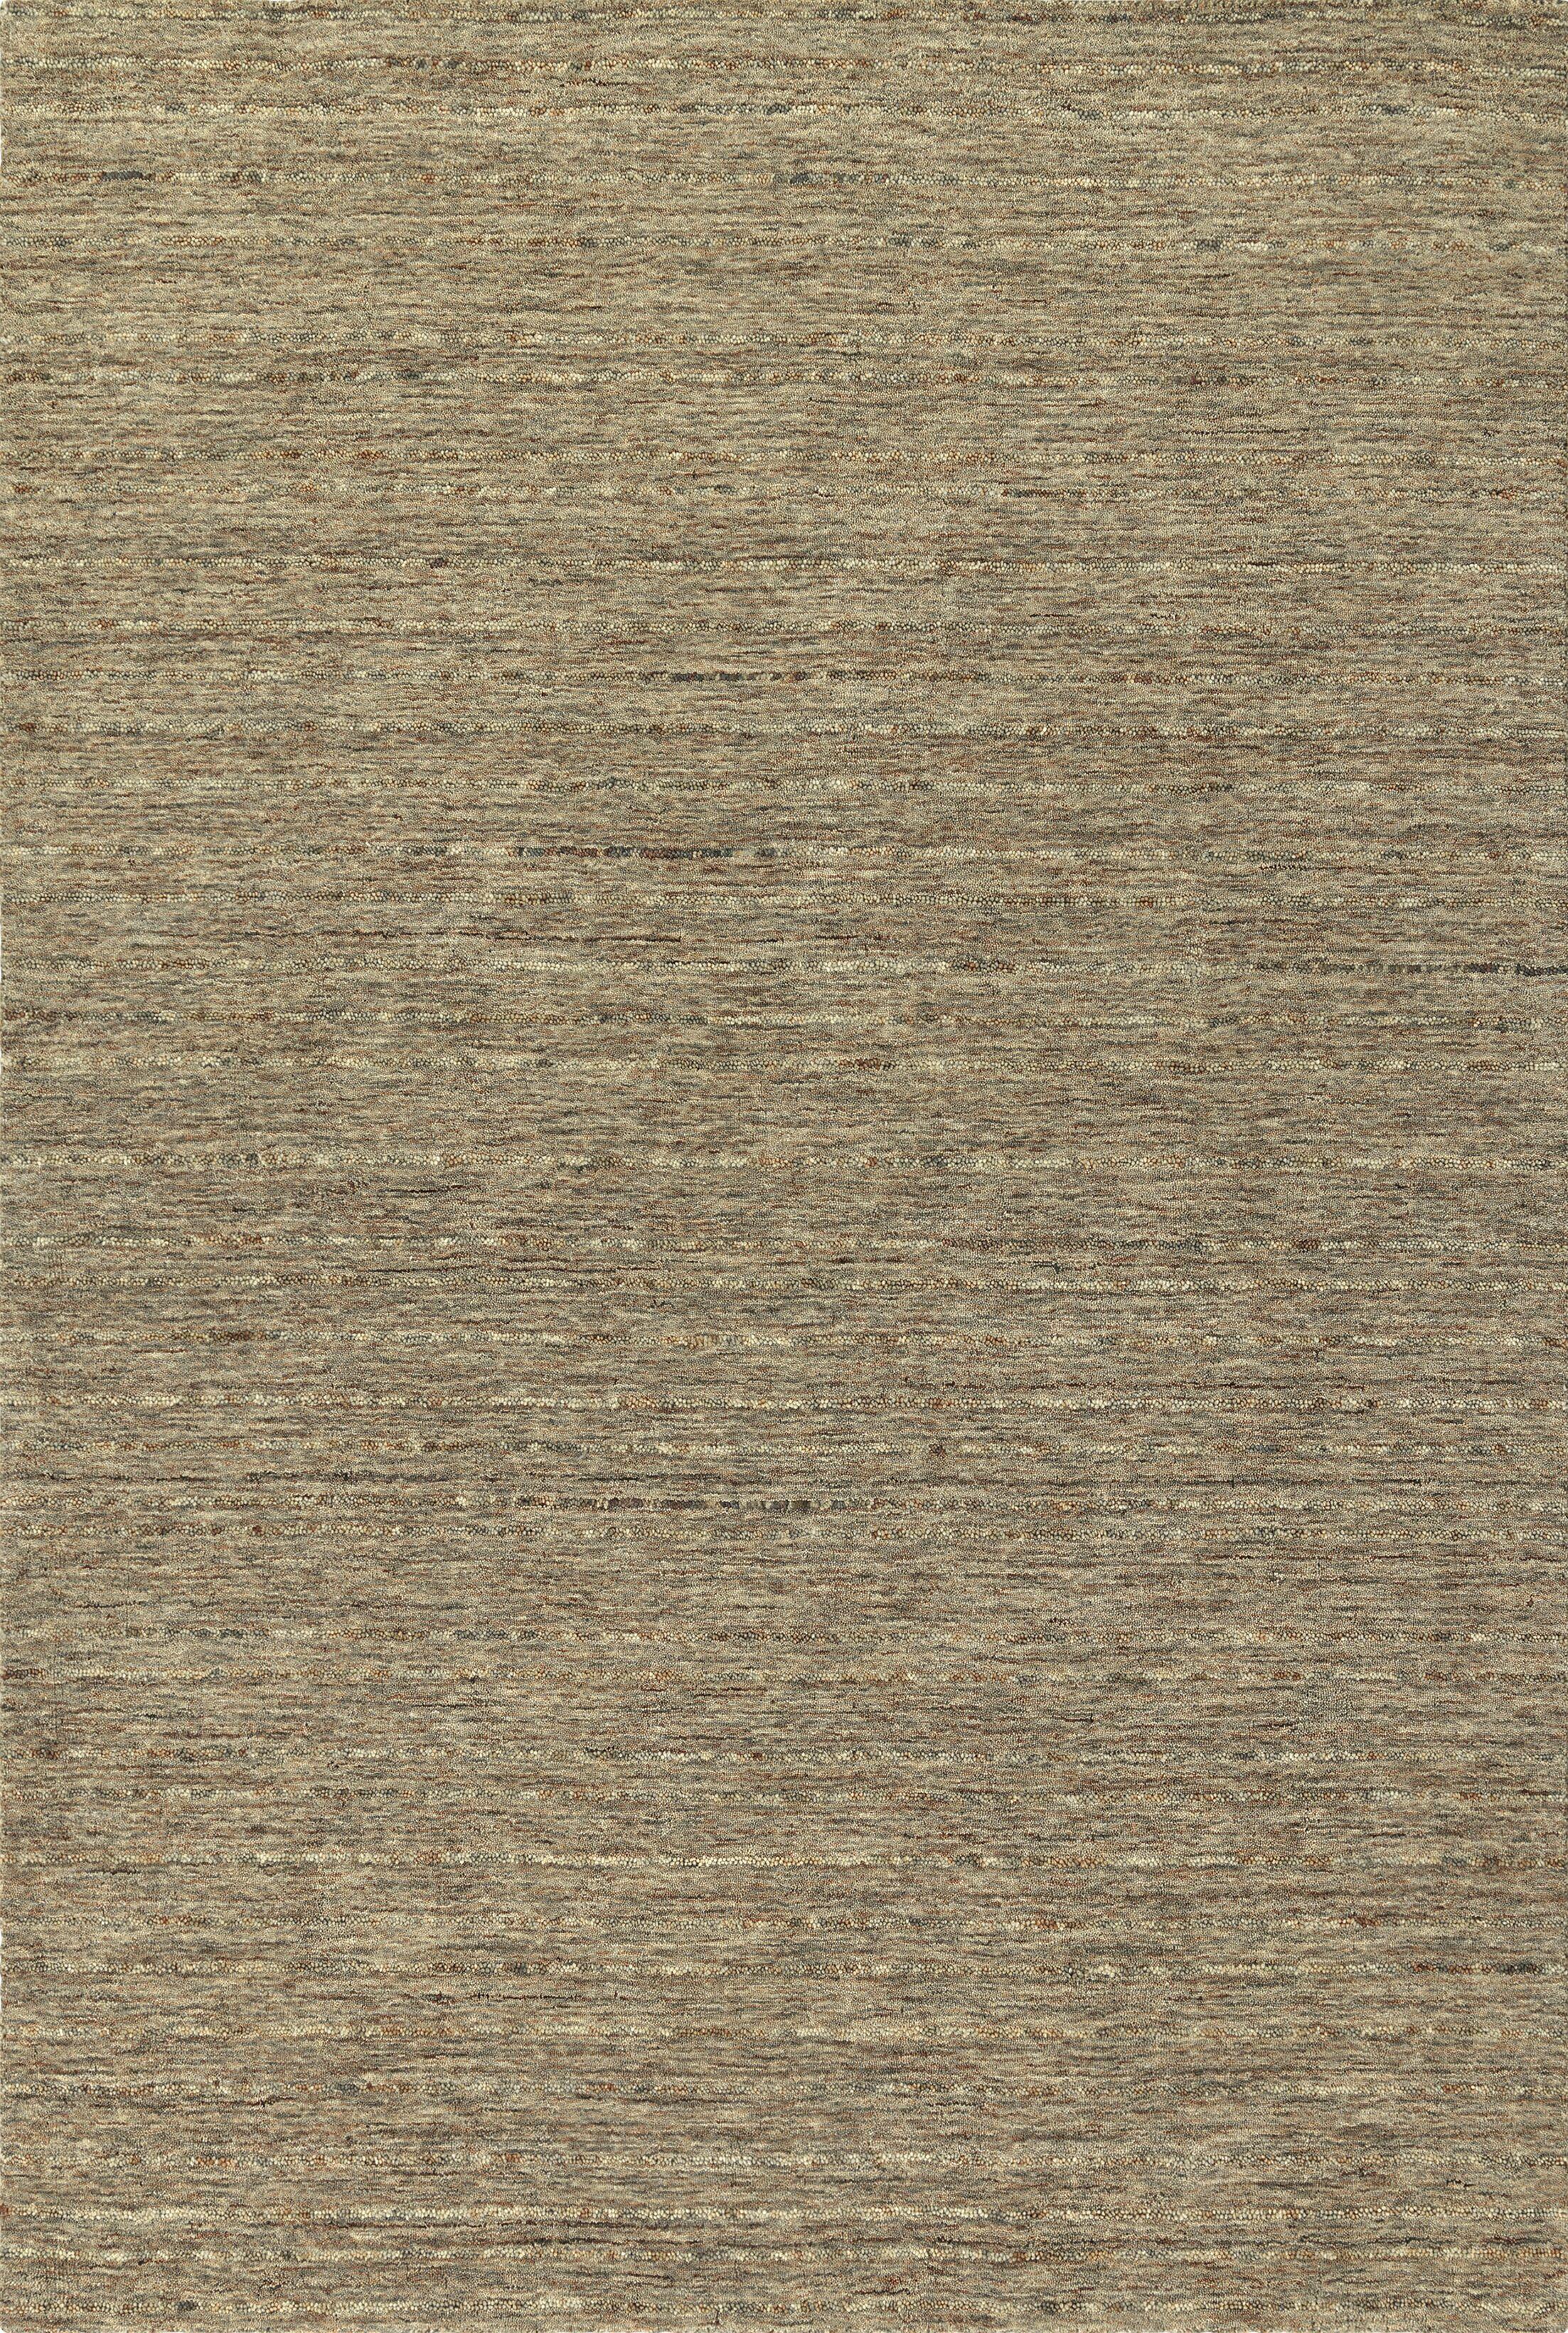 Glenville Hand-Woven Wool Desert Area Rug Rug Size: Rectangle 8' x 10'